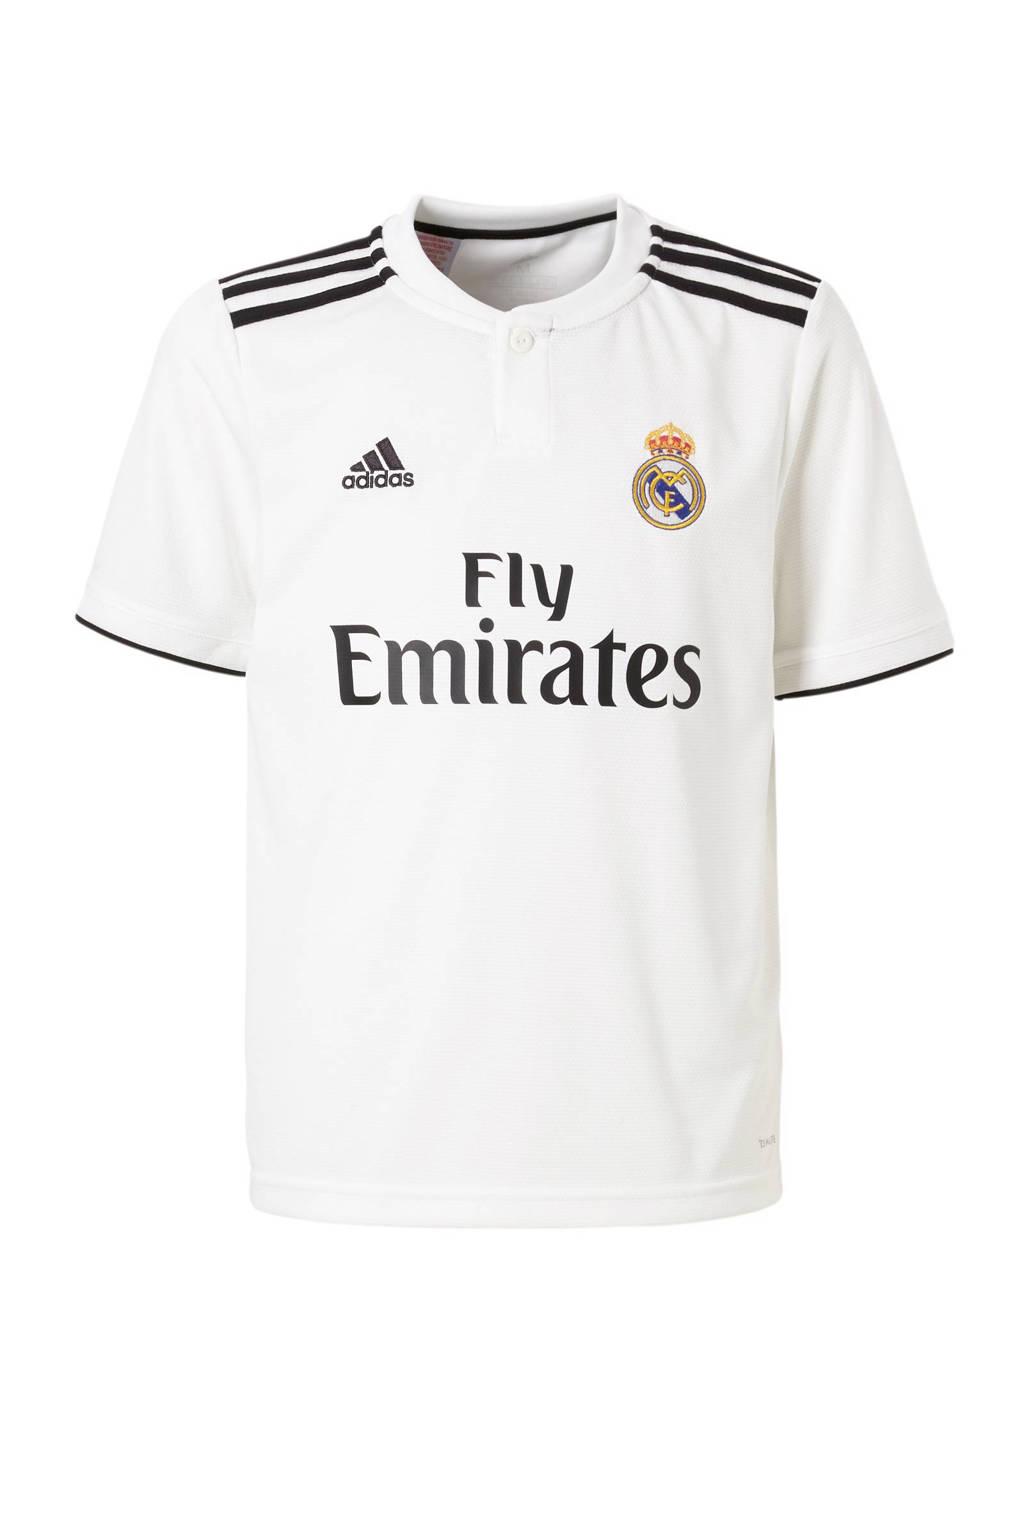 adidas Performance Junior Real Madrid Thuis voetbalshirt, Wit/zwart